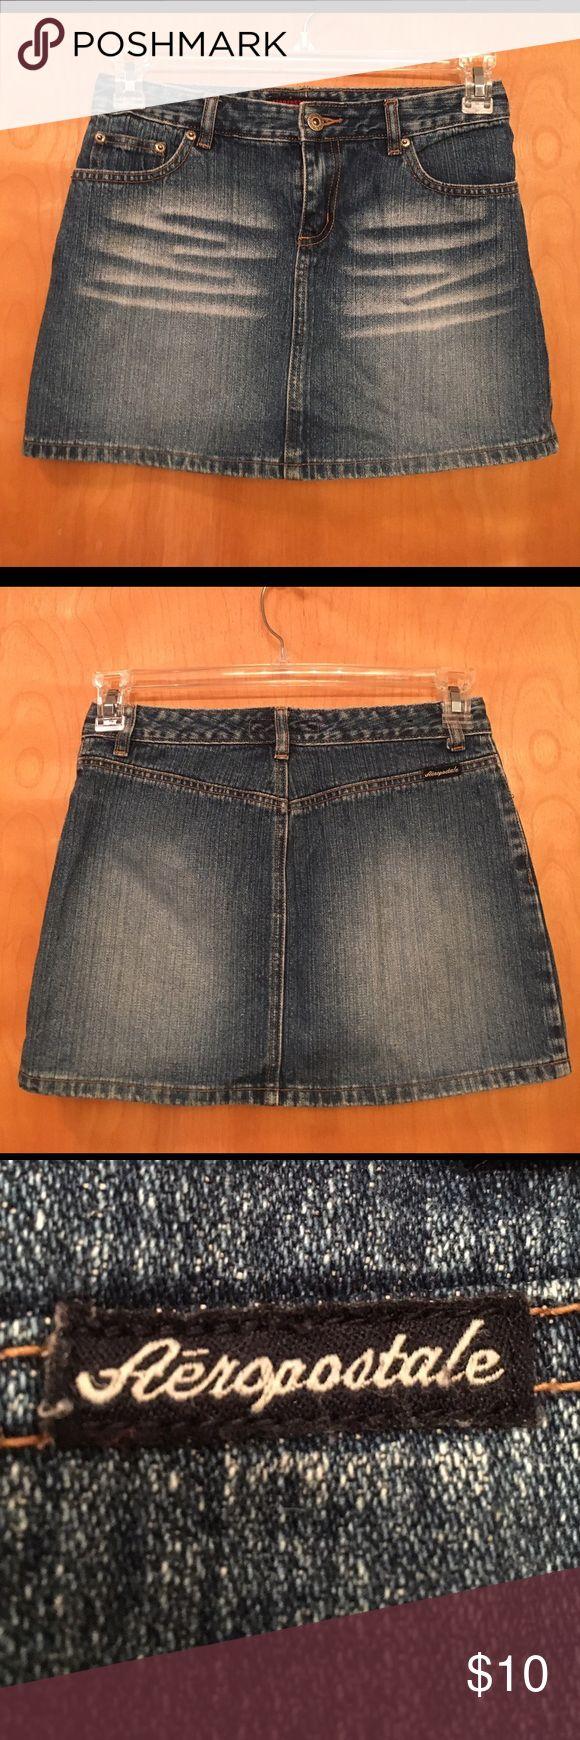 AEROPOSTALE BLUE JEAN MINI SKIRT 🌺....ADORABLE.....AEROPOSTALE MINI JEAN SKIRT.  100% cotton.  Factory Aeropostale Skirts